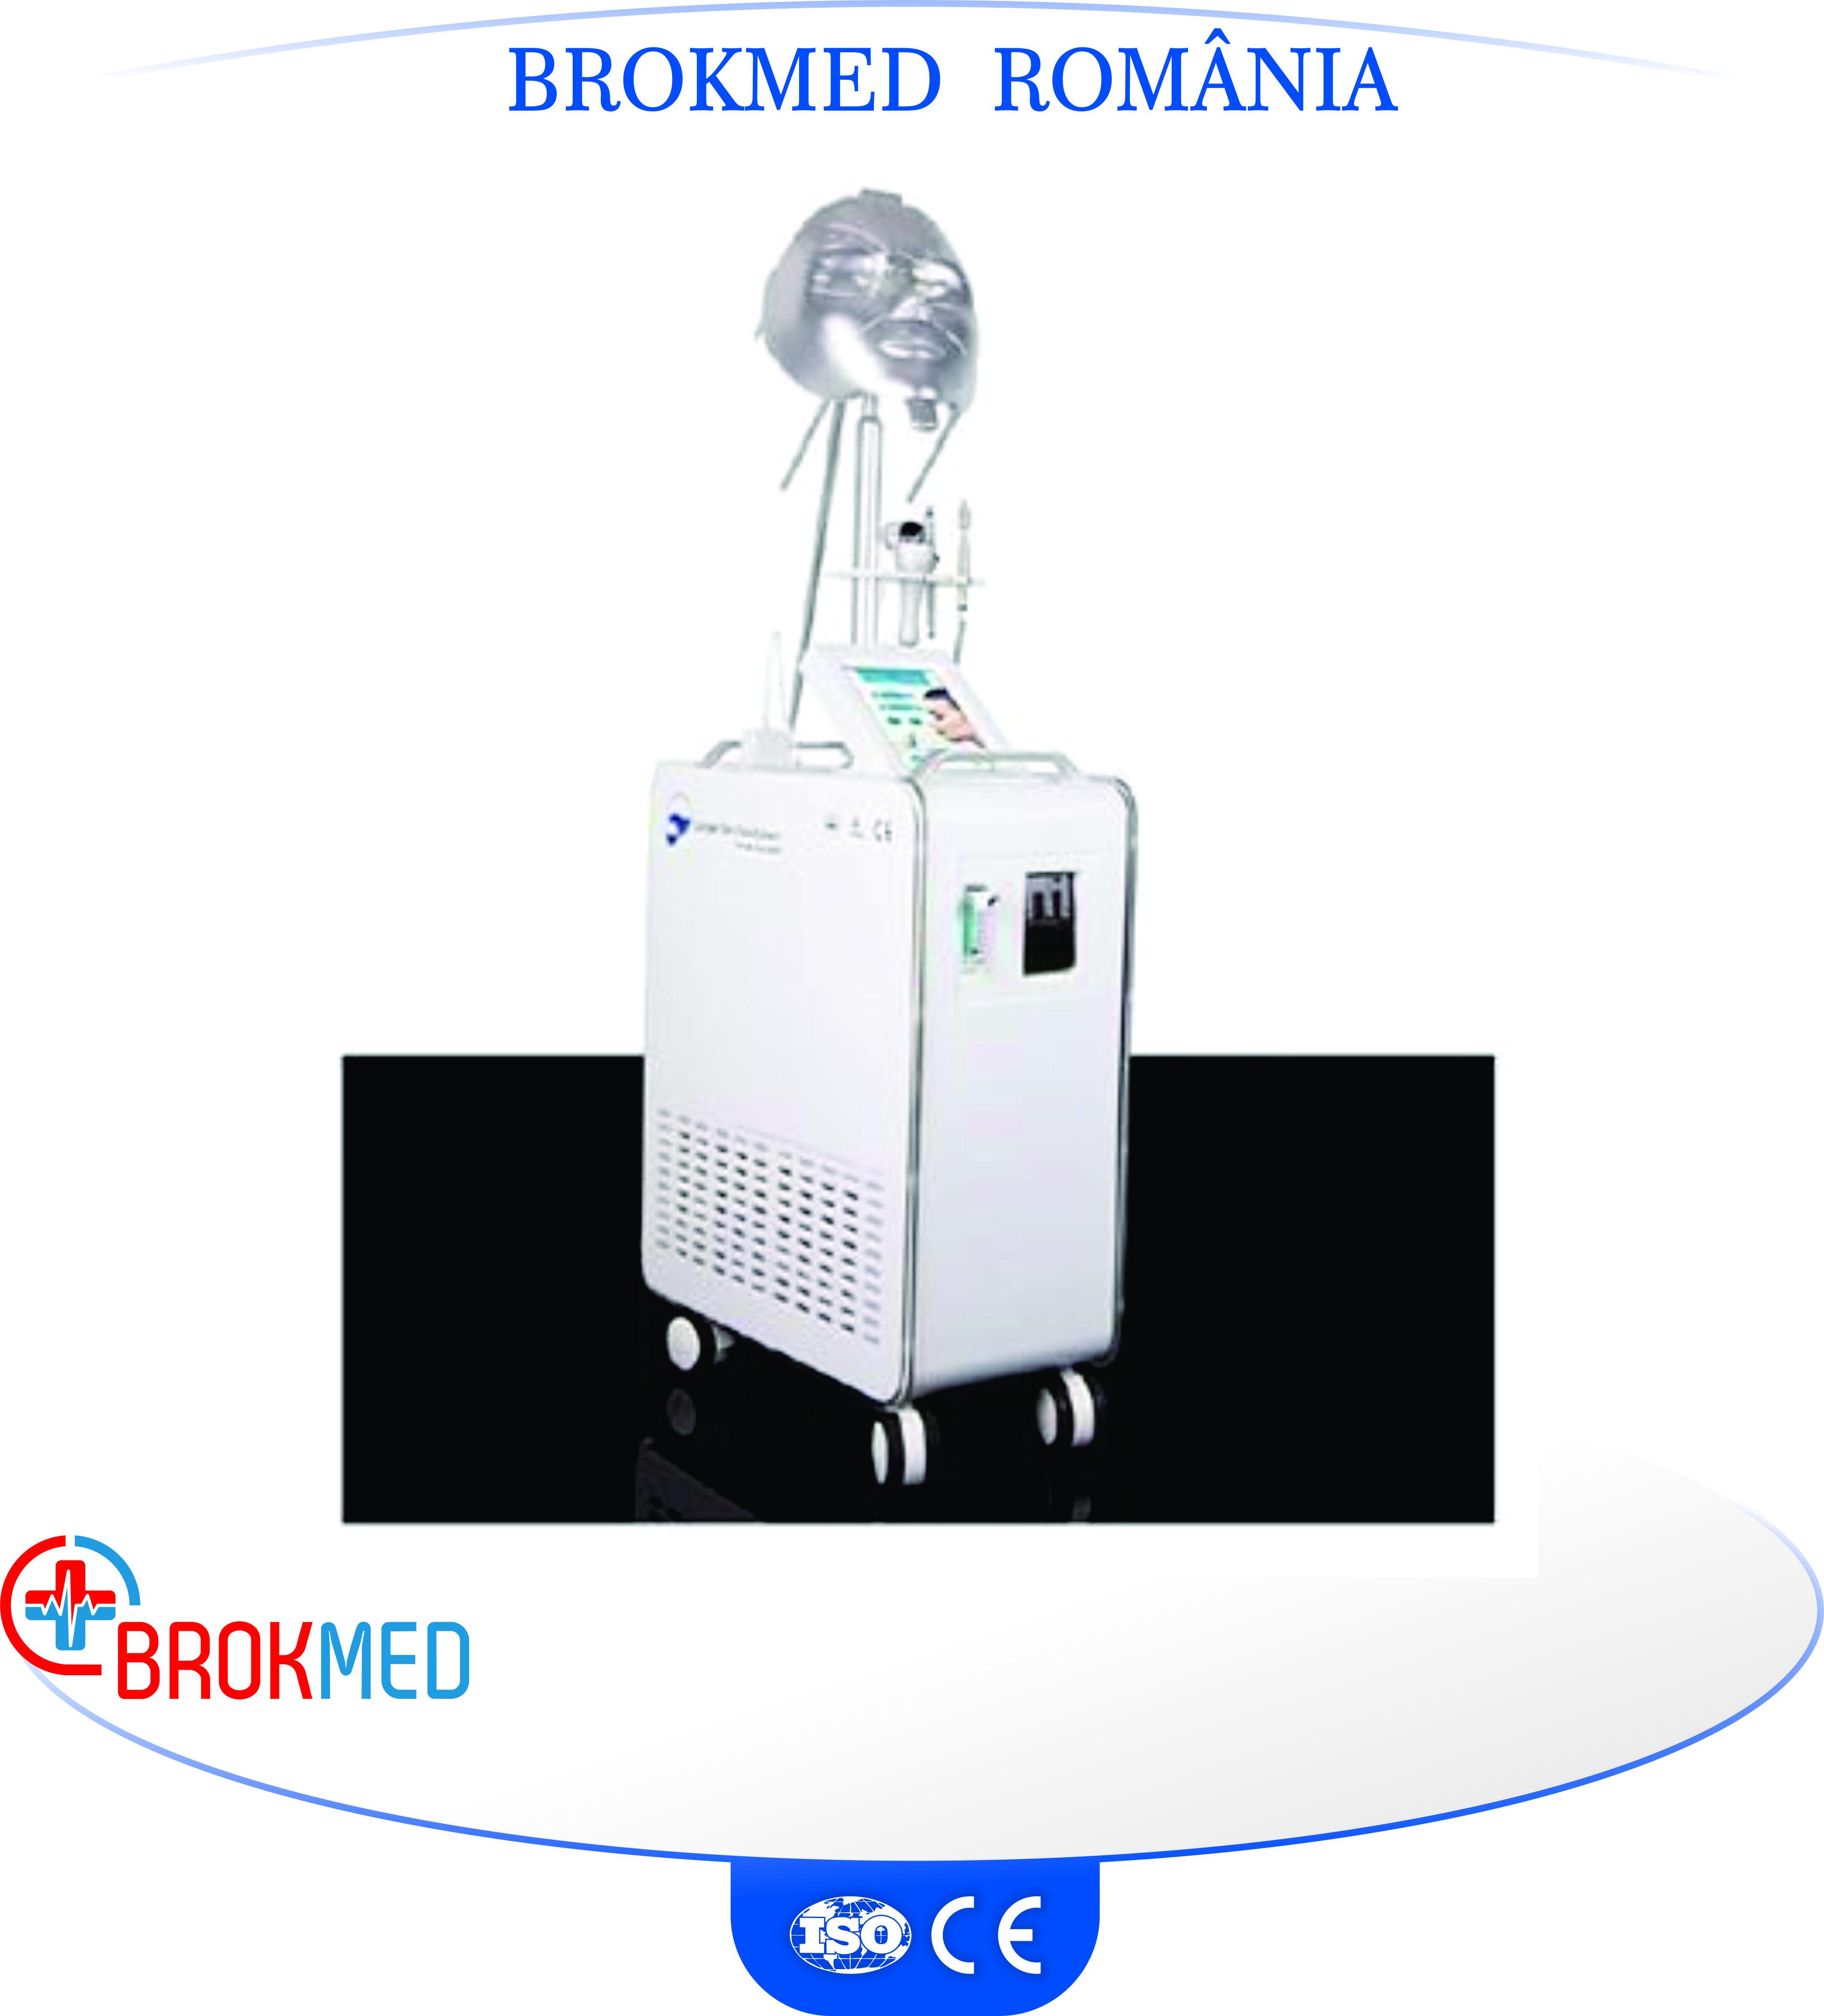 Aparat cu oxygen hyperbaric, Radiofrecventa, Microdermoabraziune si Masca Photon cu laser infrarosu pentru Rejuvenare faciala